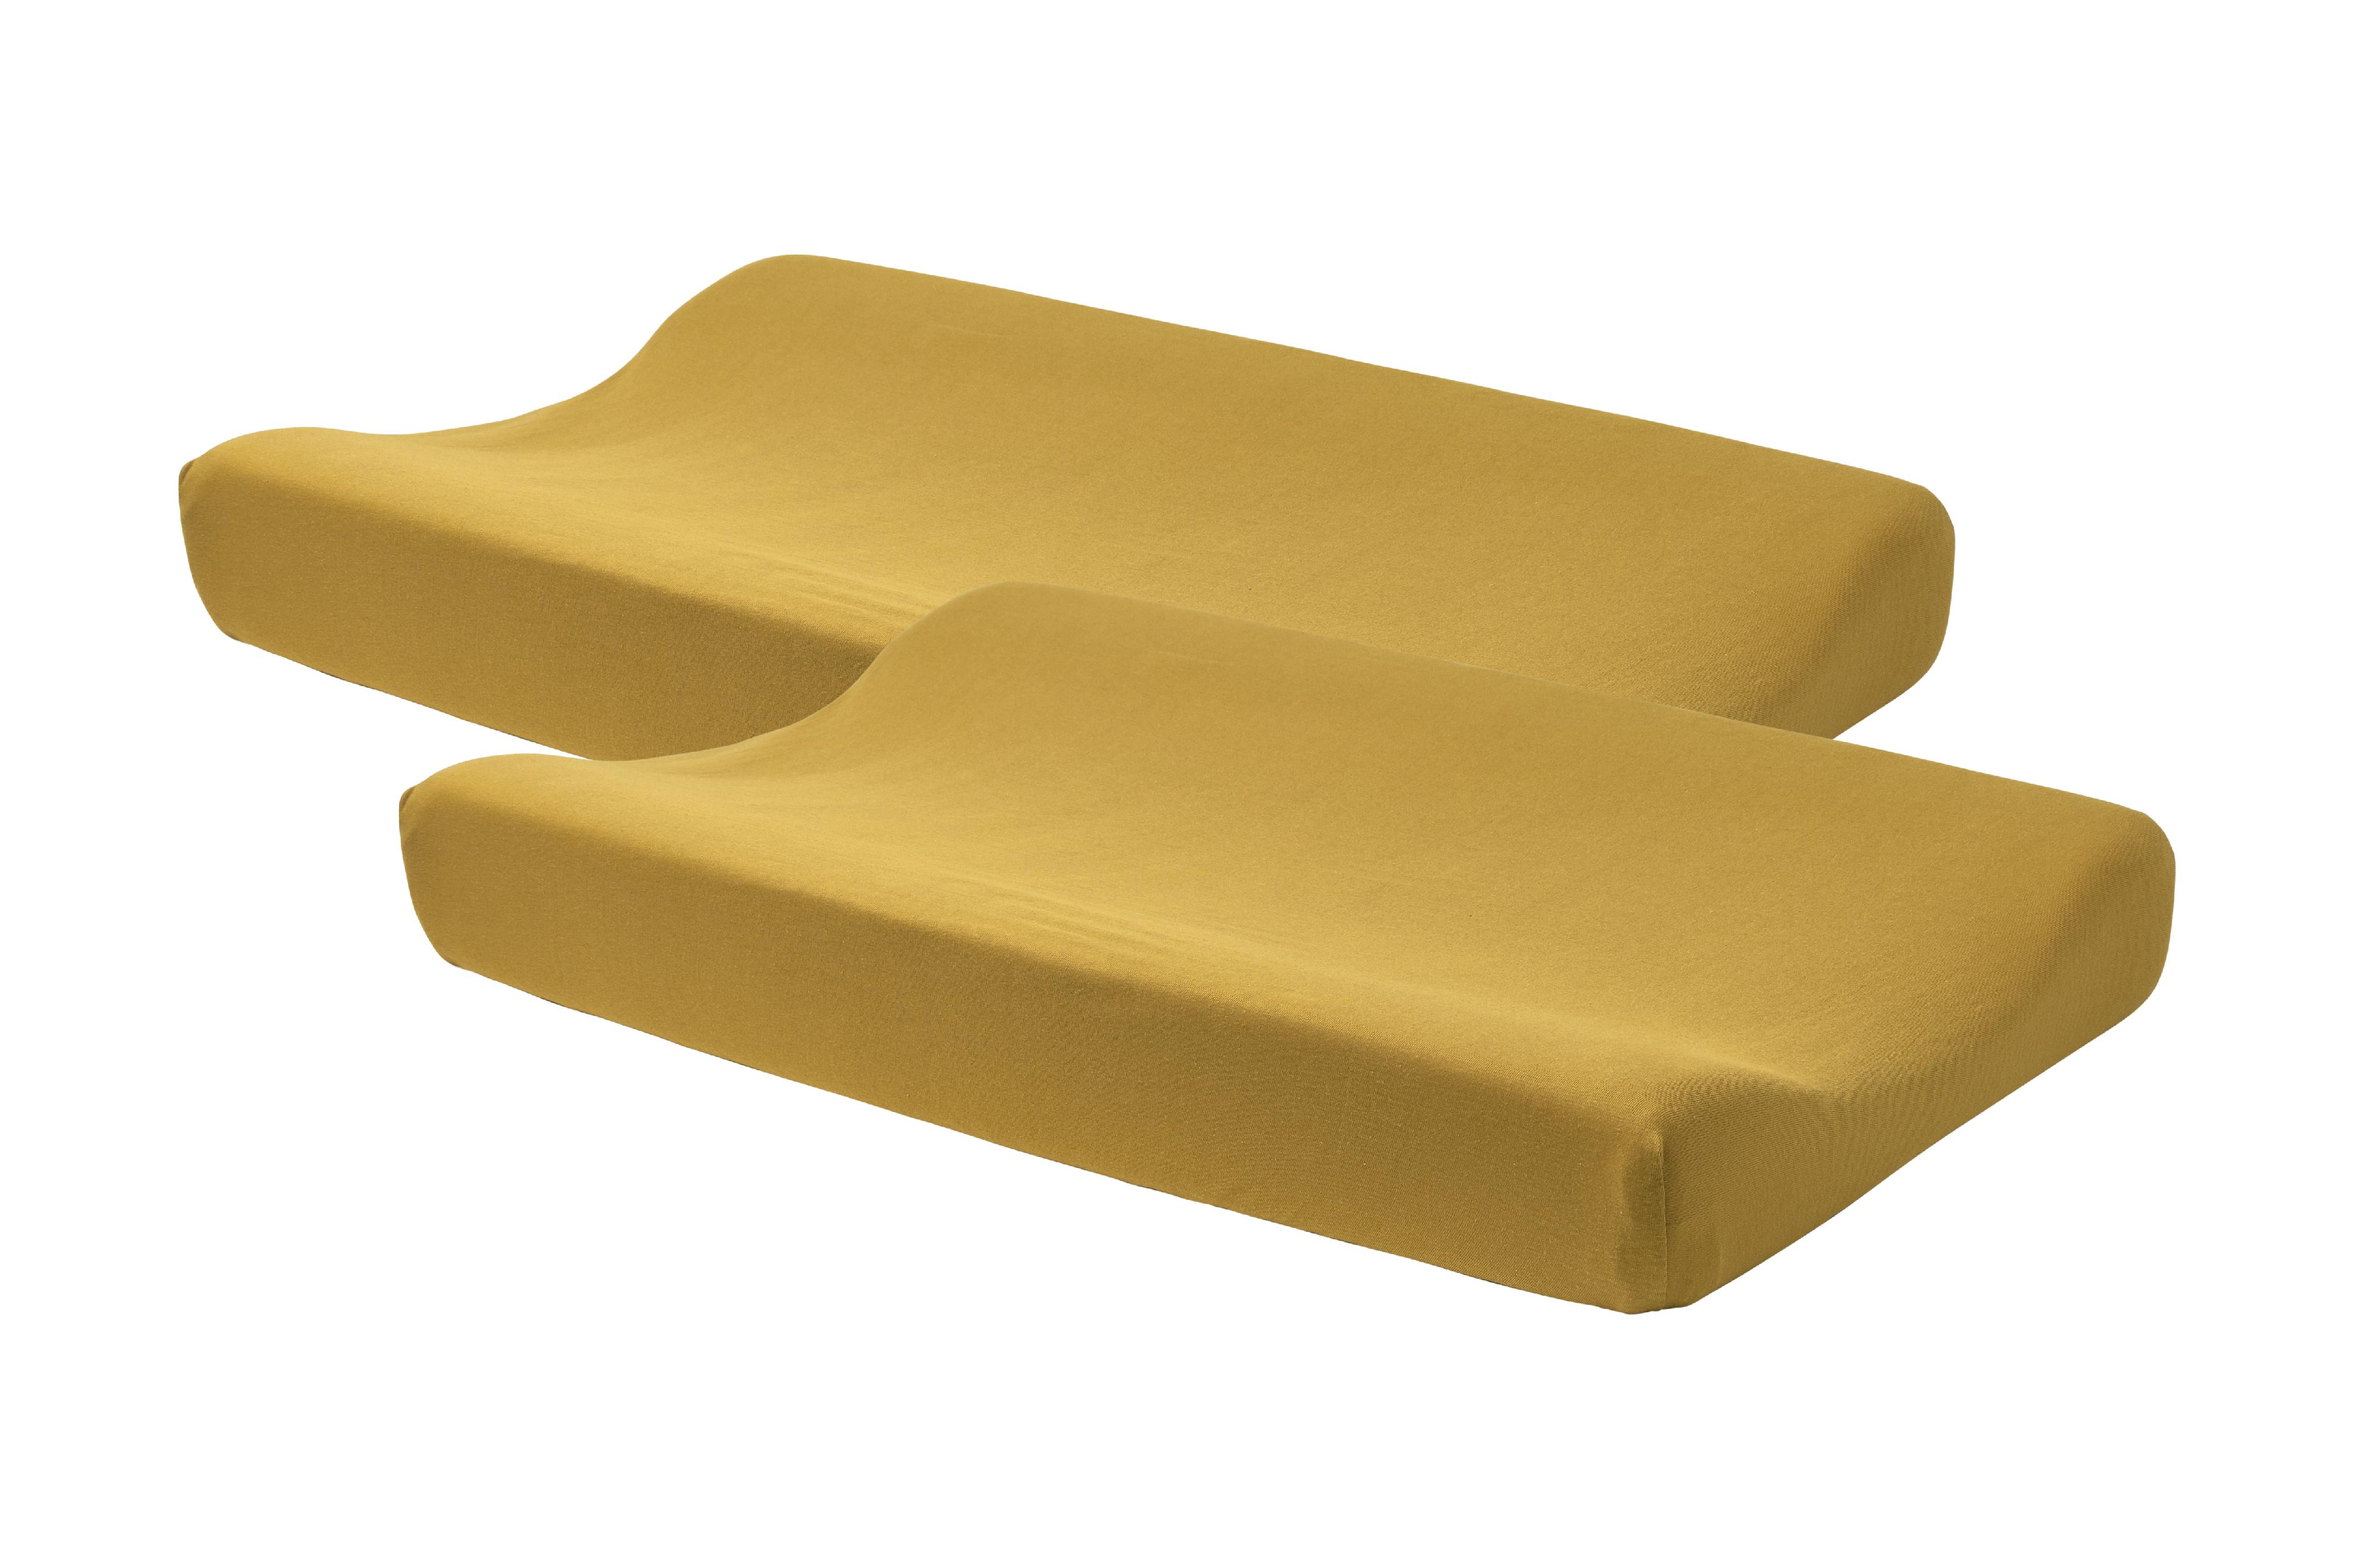 Wickelauflagenbezug Basic Jersey 2-Pack - Honey Gold - 50x70cm